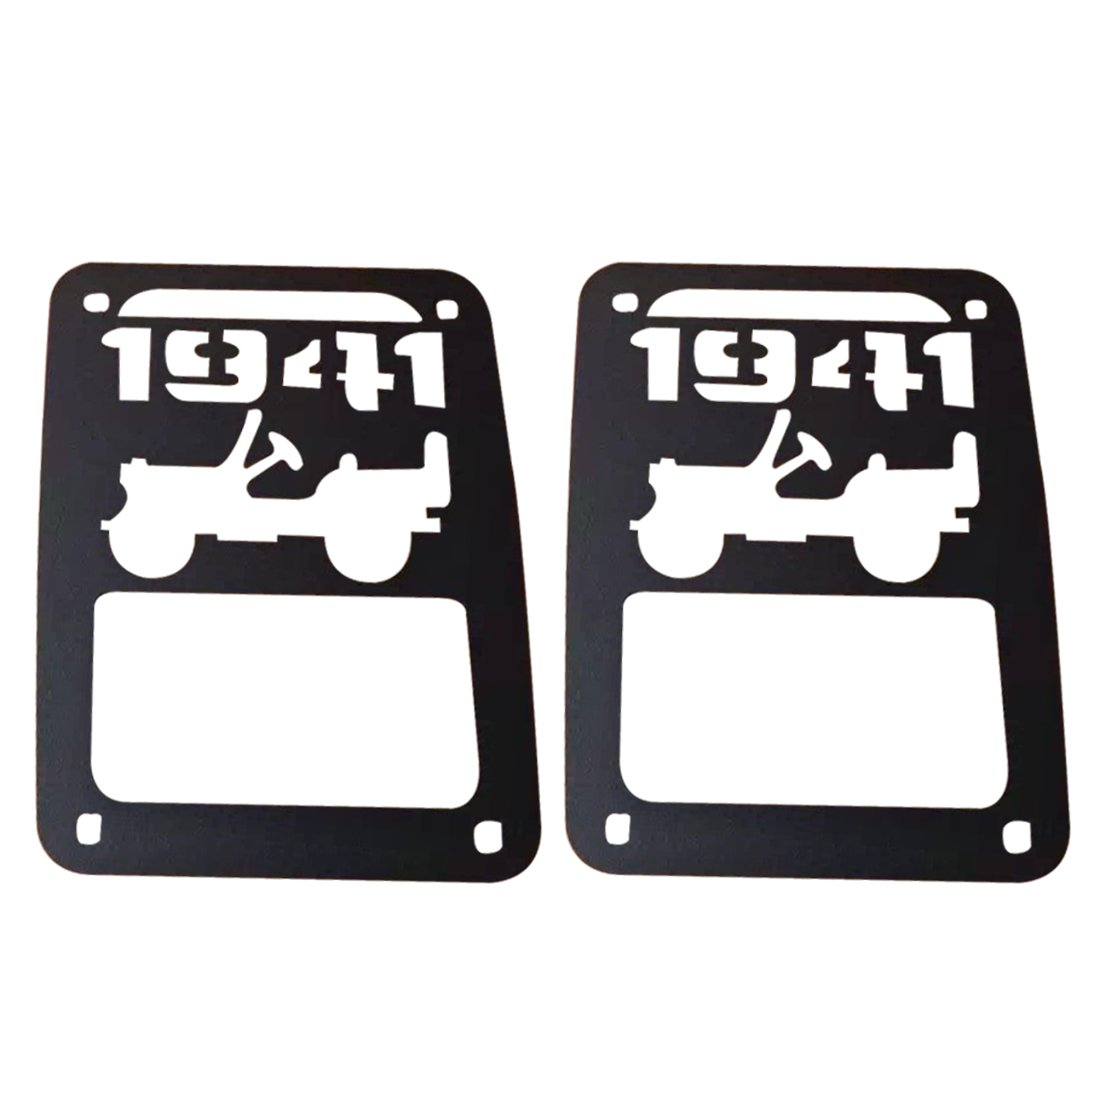 1941 Logo Tail Light Cover 2 Pcs Black Metal Tail Lamp Protector Guards Trim for Jeep Wrangler JK 2007-2015 SUPAREE